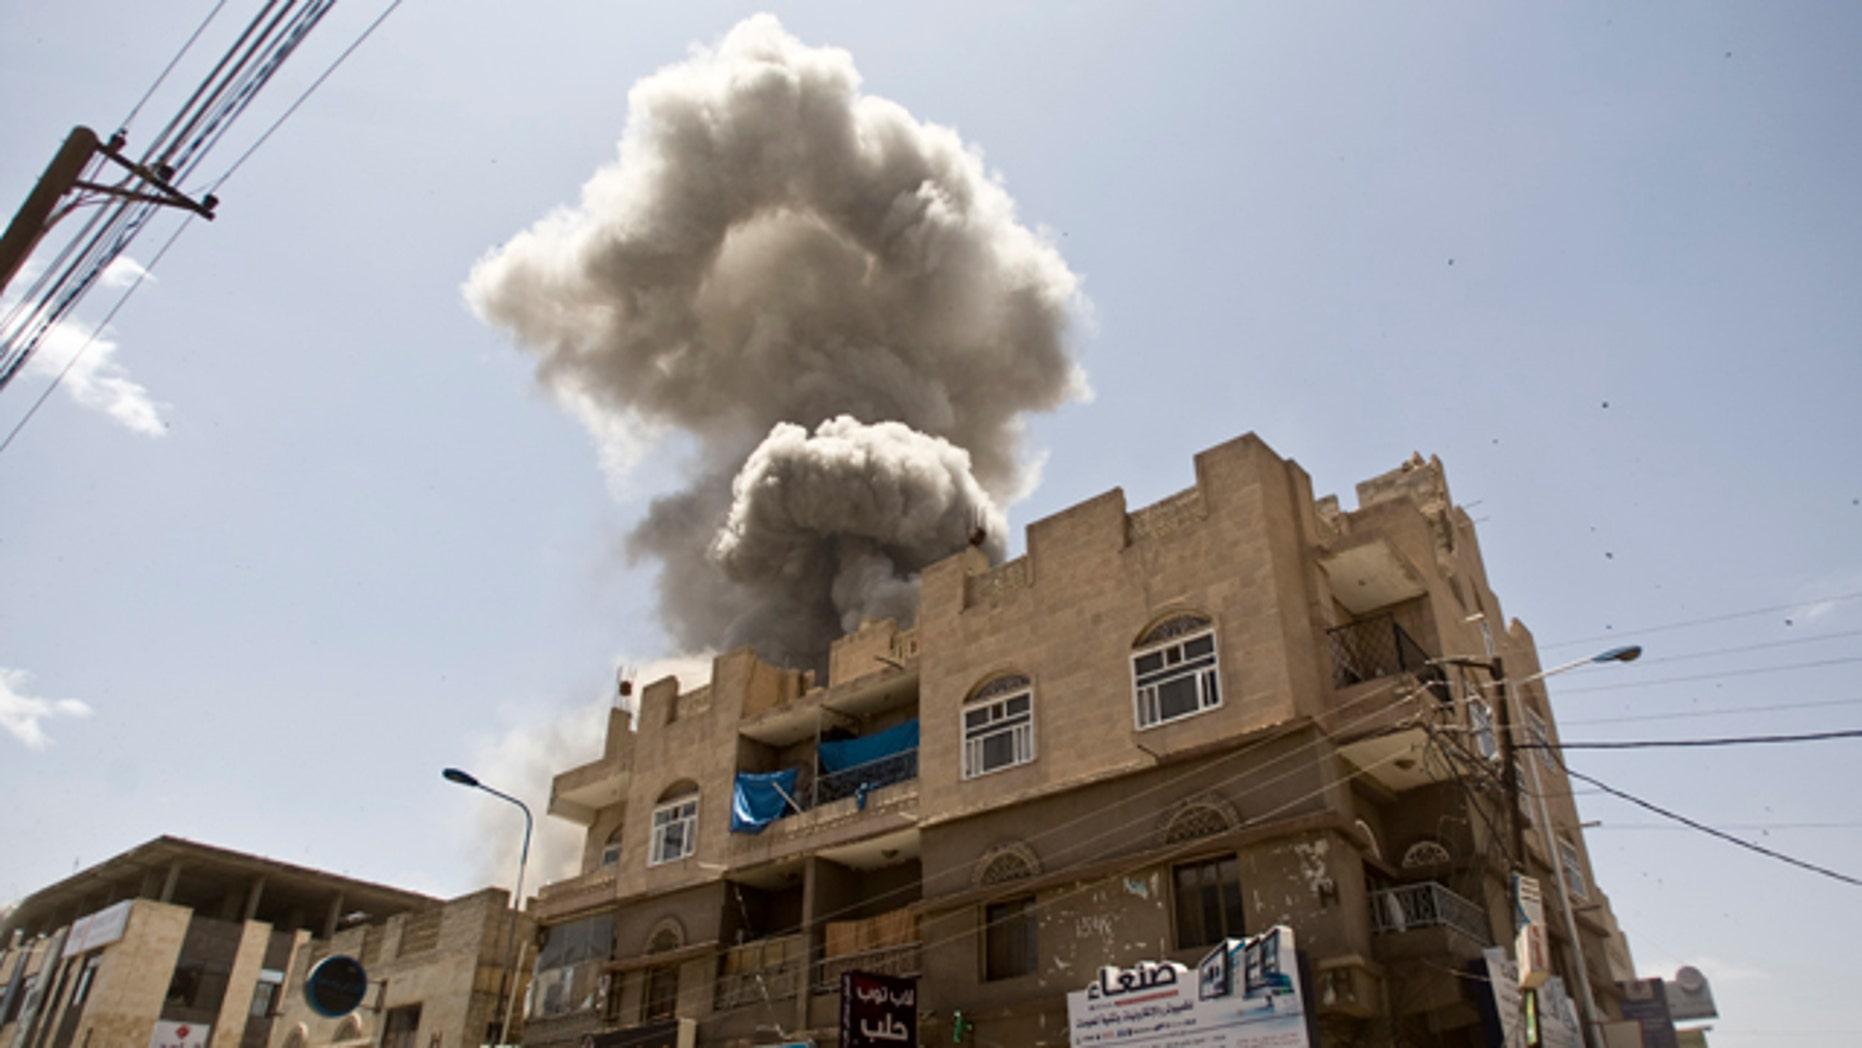 May 10, 2015: Smoke rises from a house of former Yemeni president Ali Abdullah Saleh after a Saudi-led airstrike in Sanaa, Yemen. (AP Photo/Hani Mohammed, File)